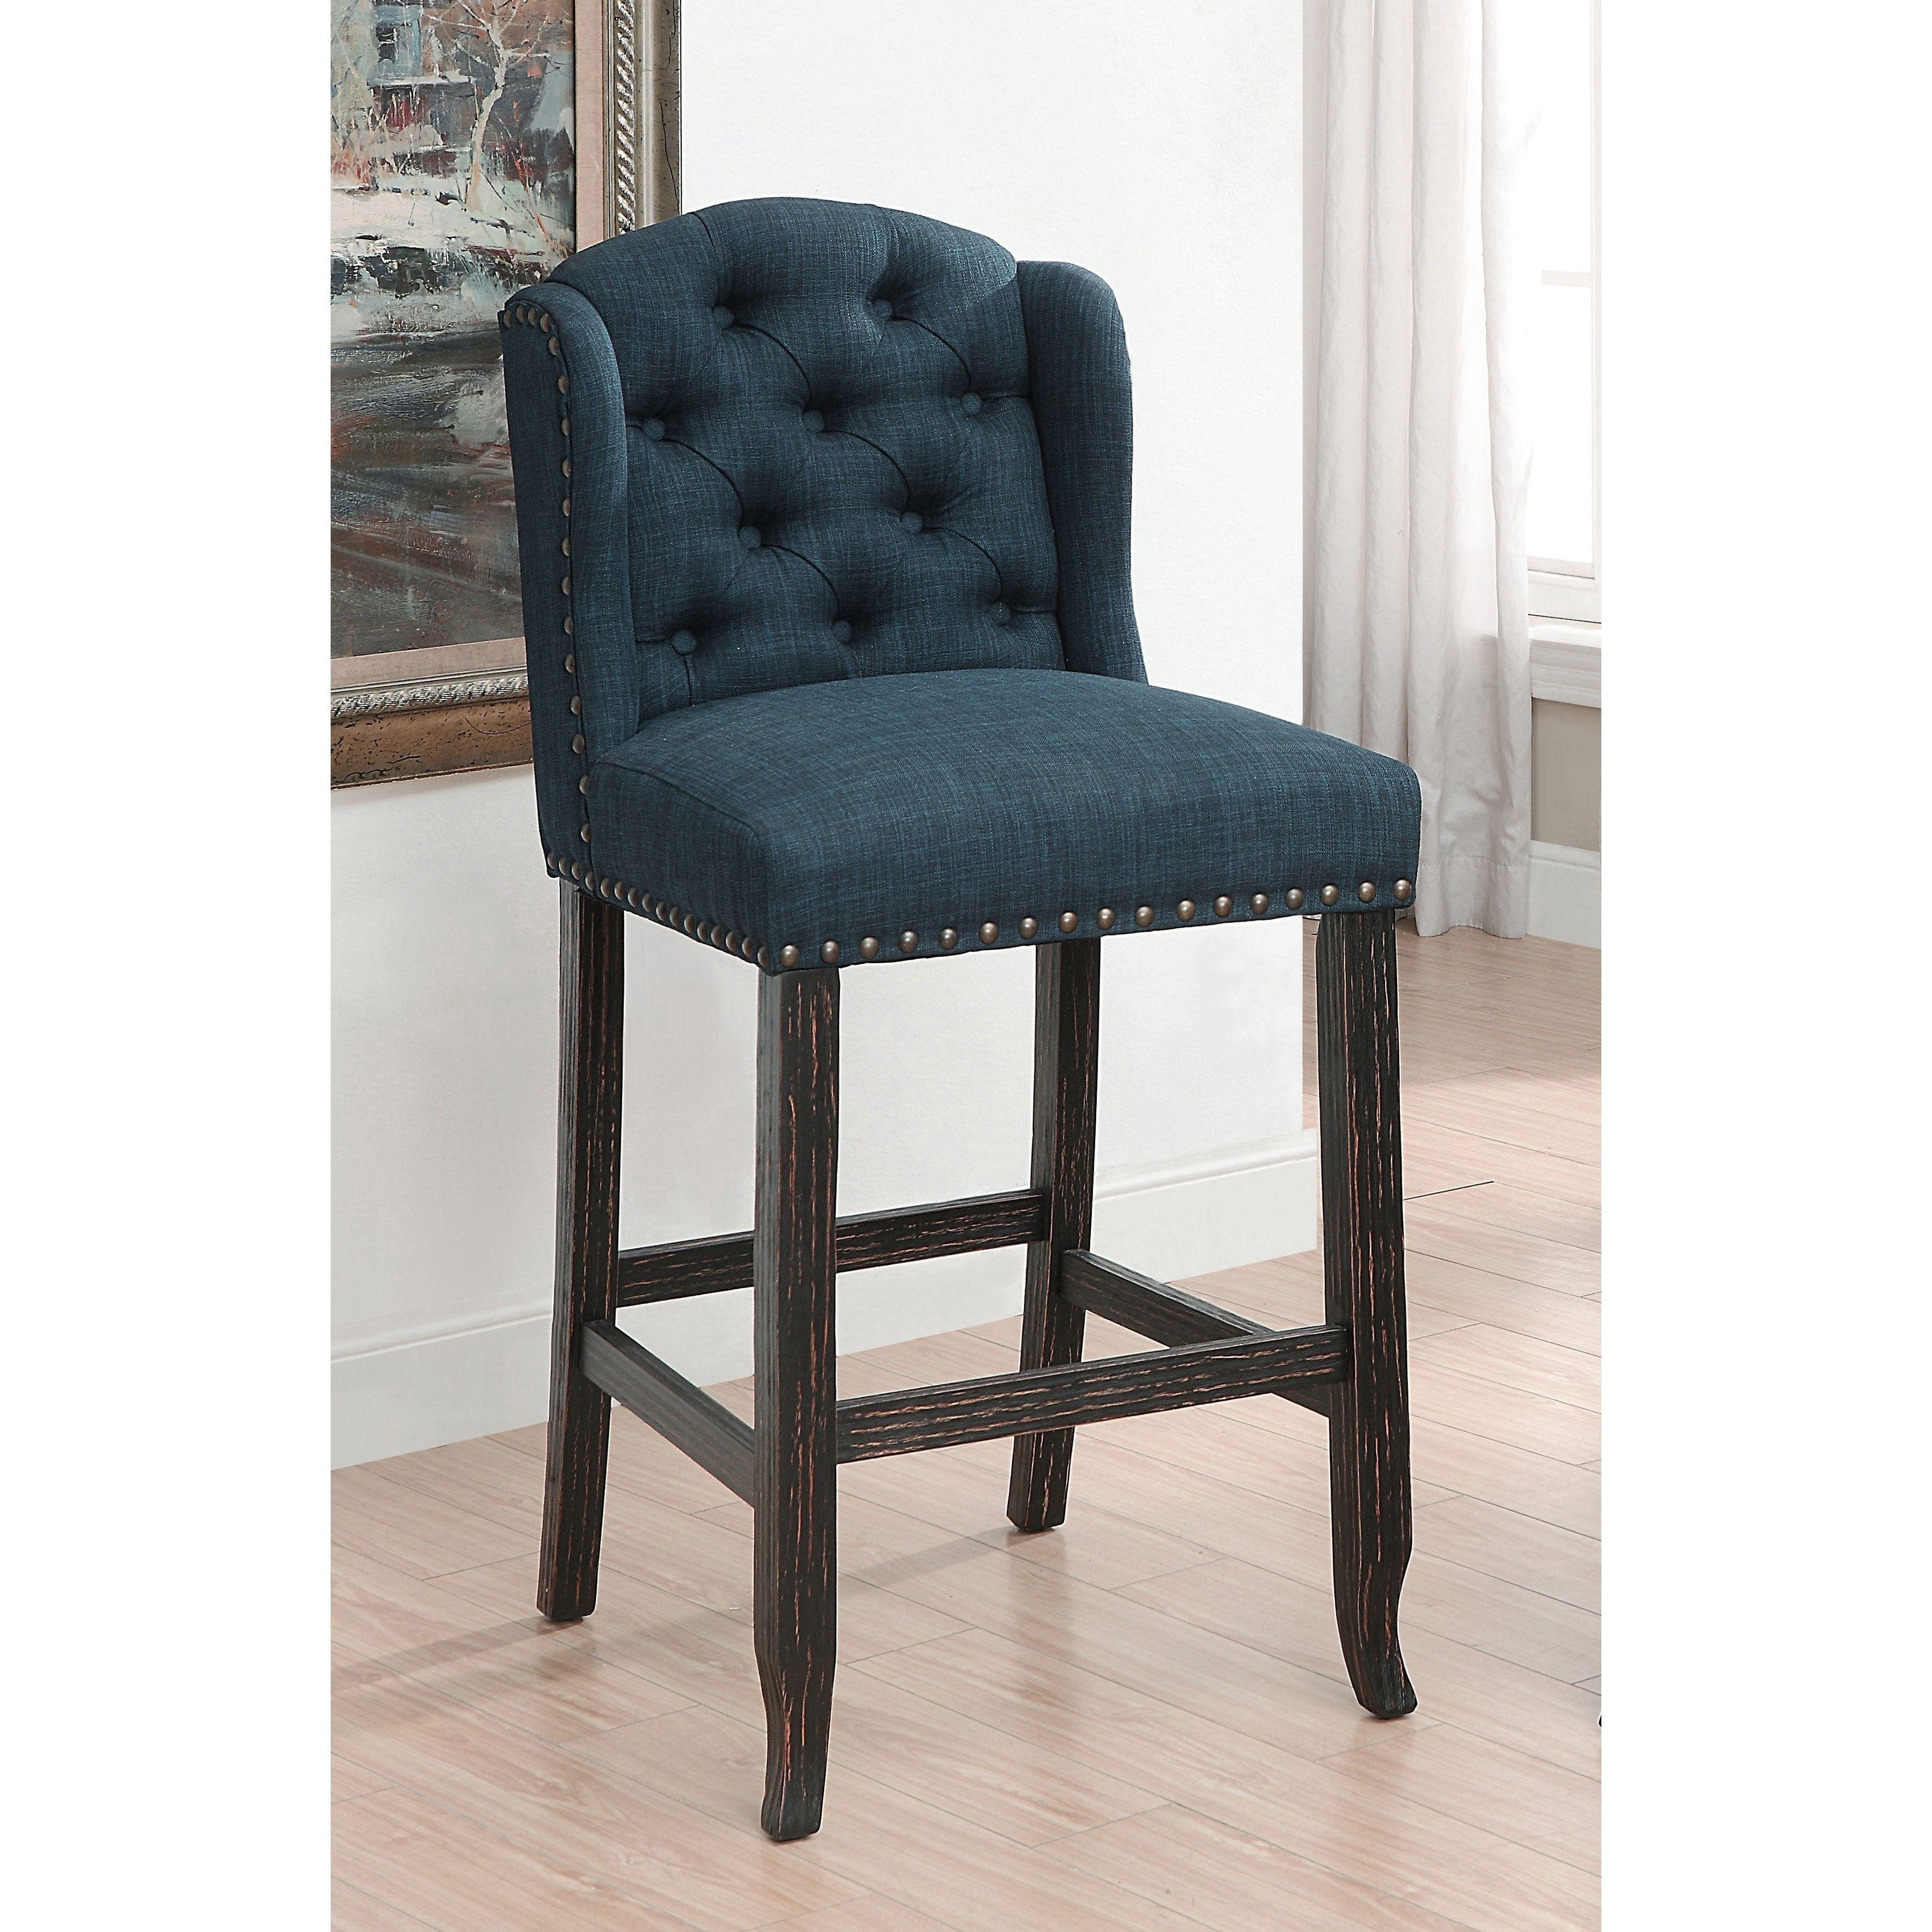 Super Furniture Of America Telara Contemporary Tufted Wingback 30 Cjindustries Chair Design For Home Cjindustriesco